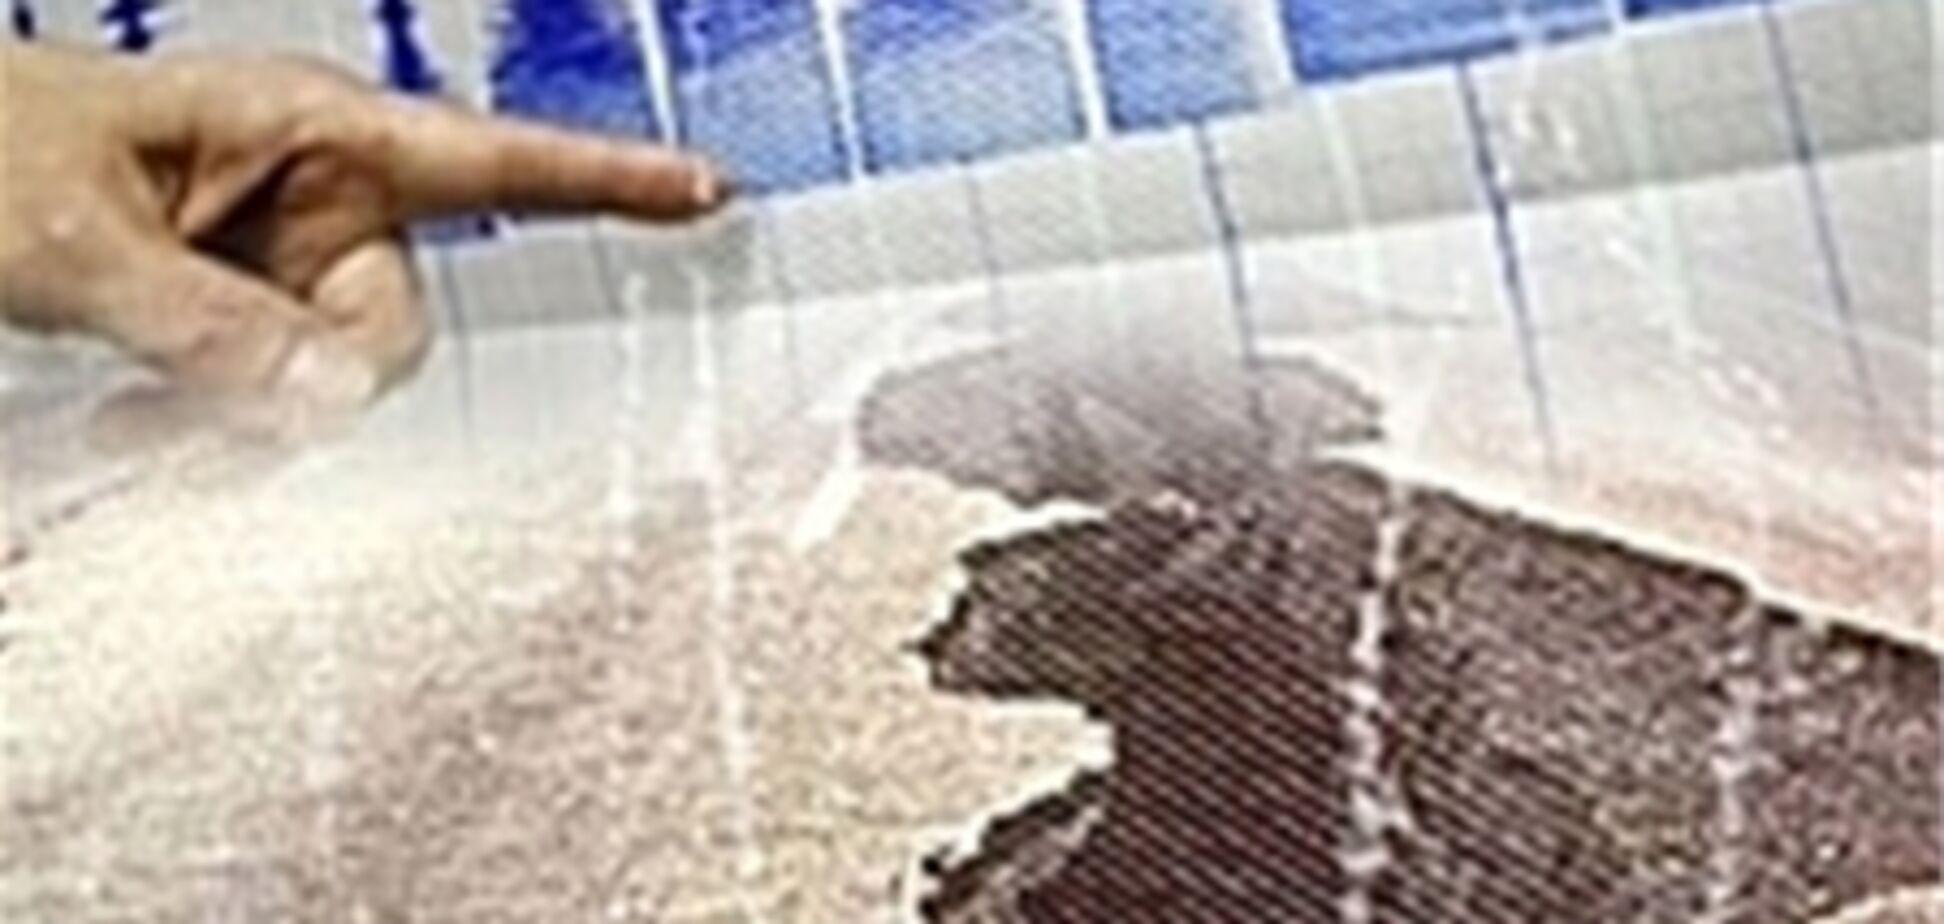 Близько 20 землетрусів сталося у Румунії за останню добу